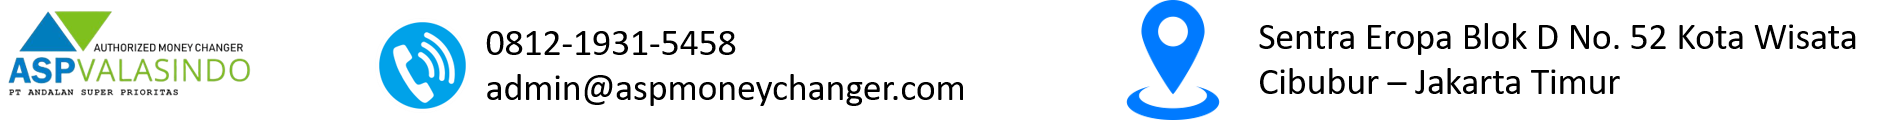 aspcorporation